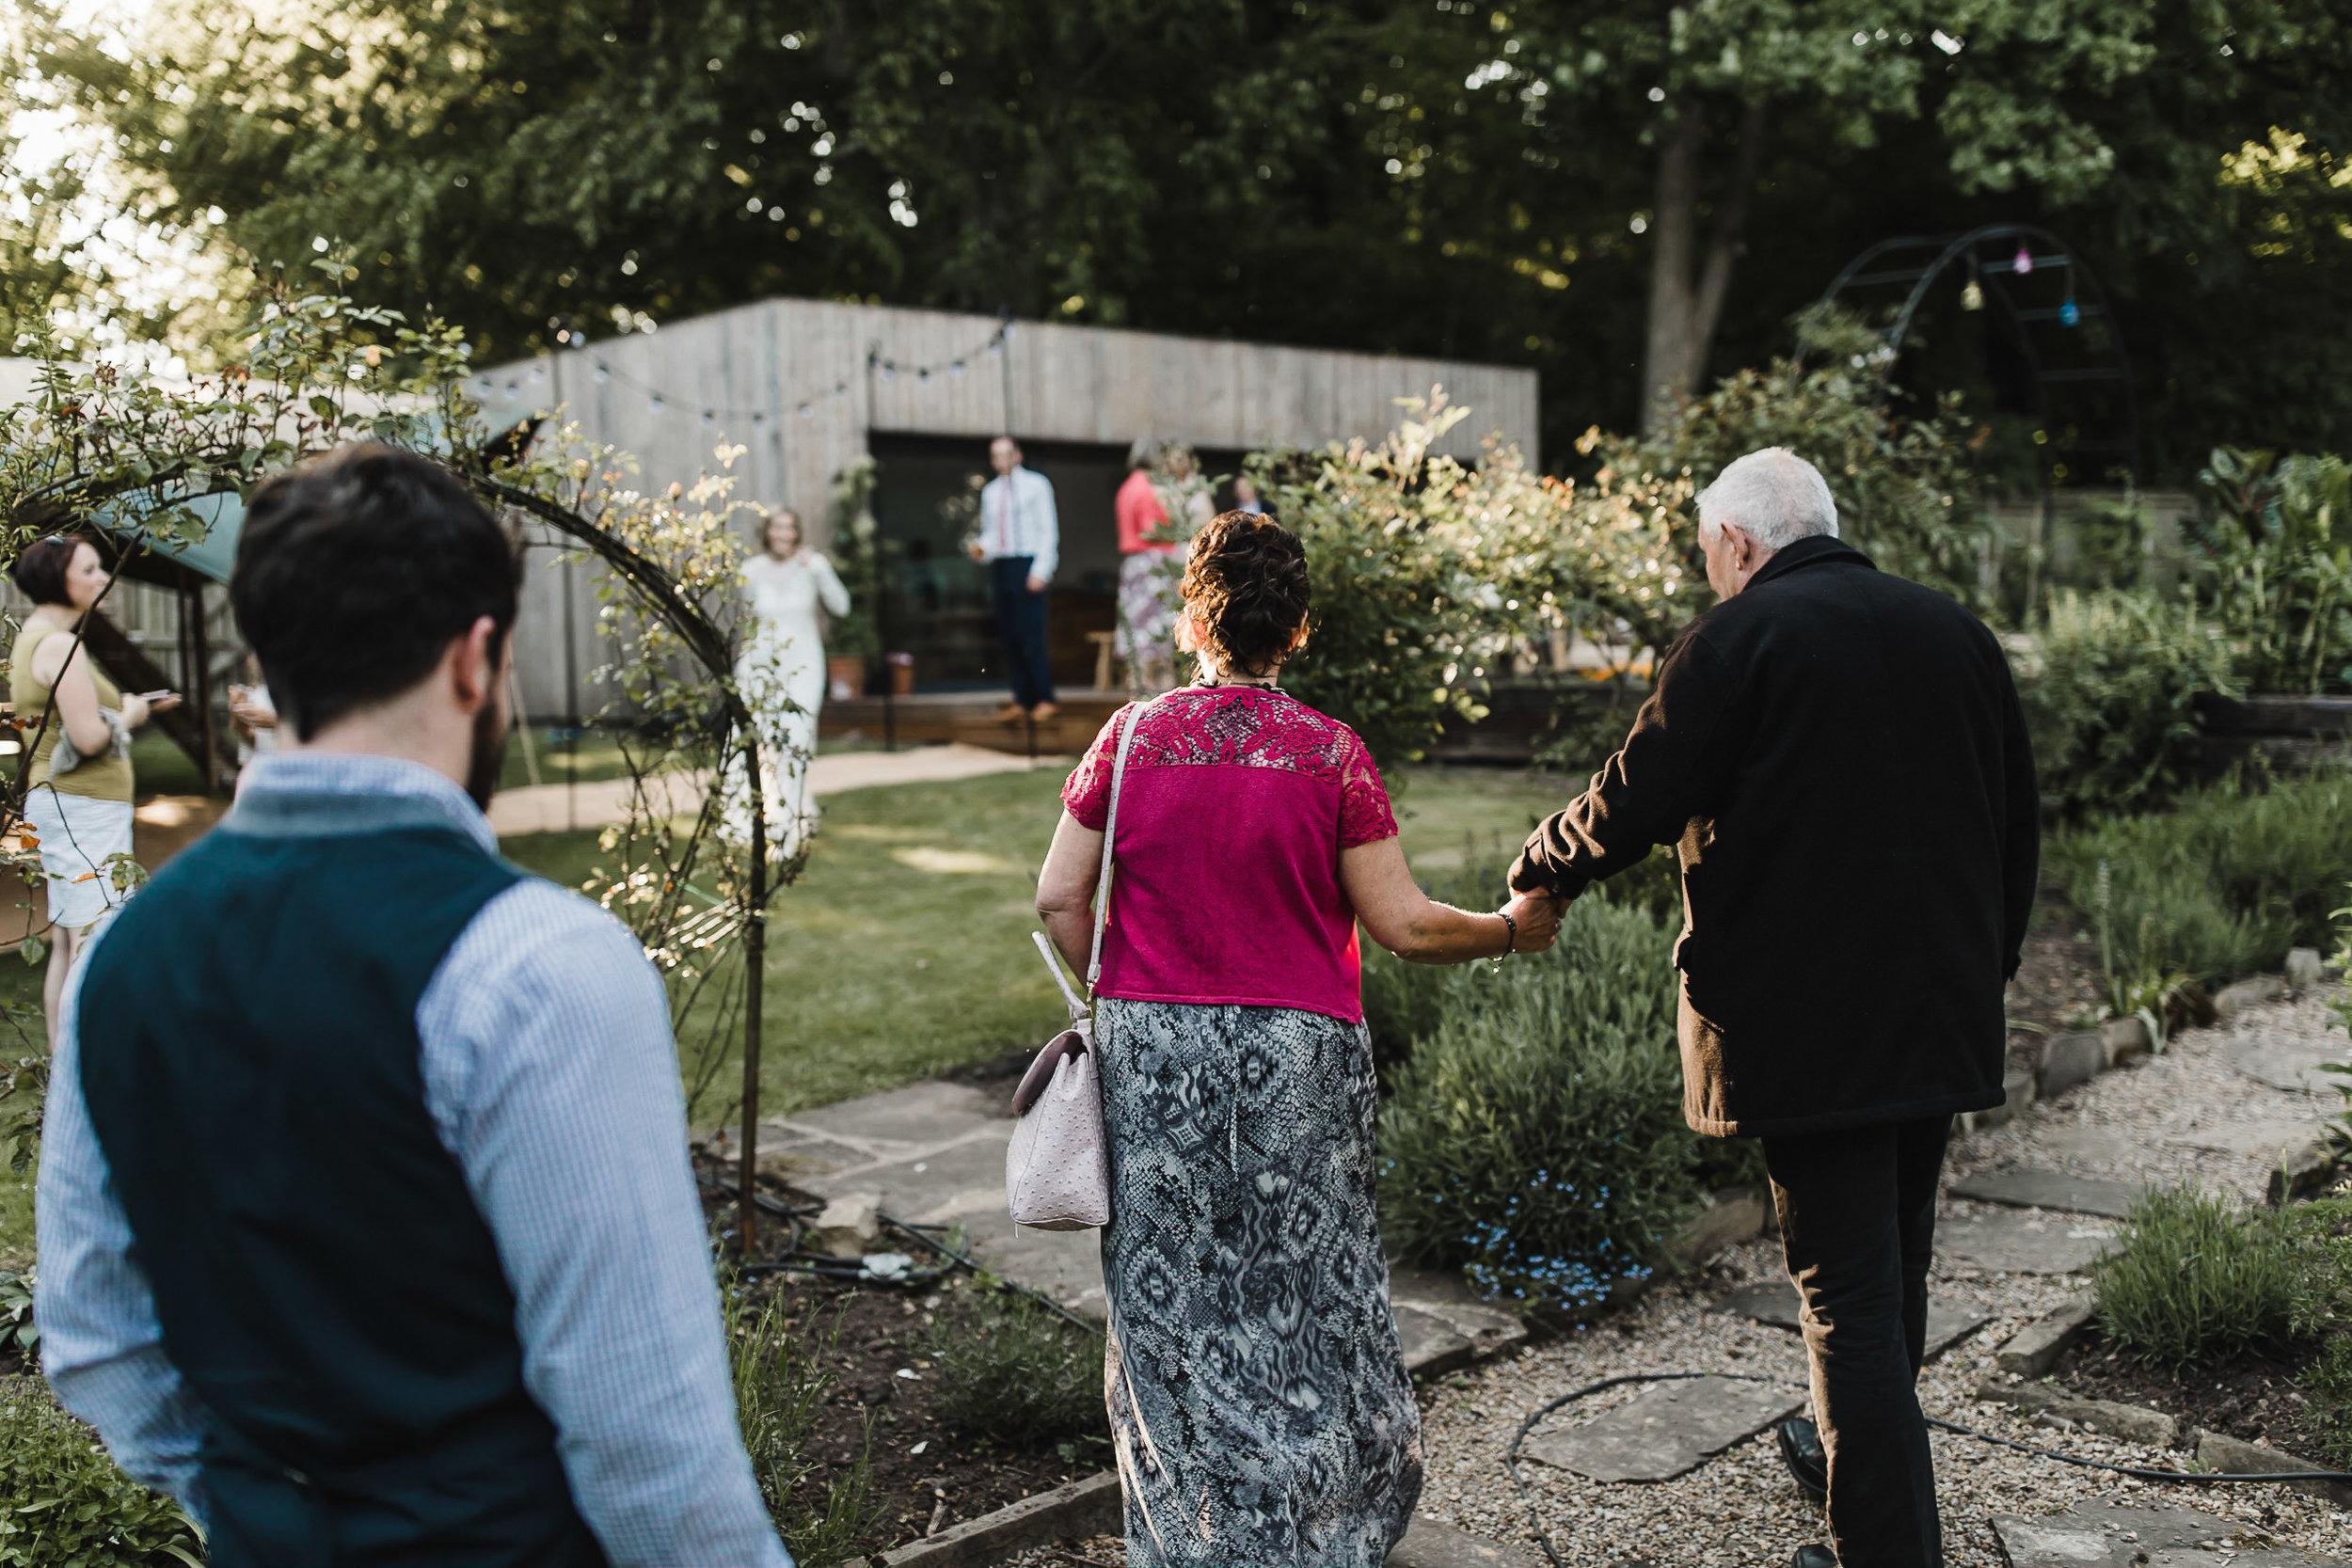 Roundhay-Leeds-Backyard-Wedding-Becs-Chris-207.jpg